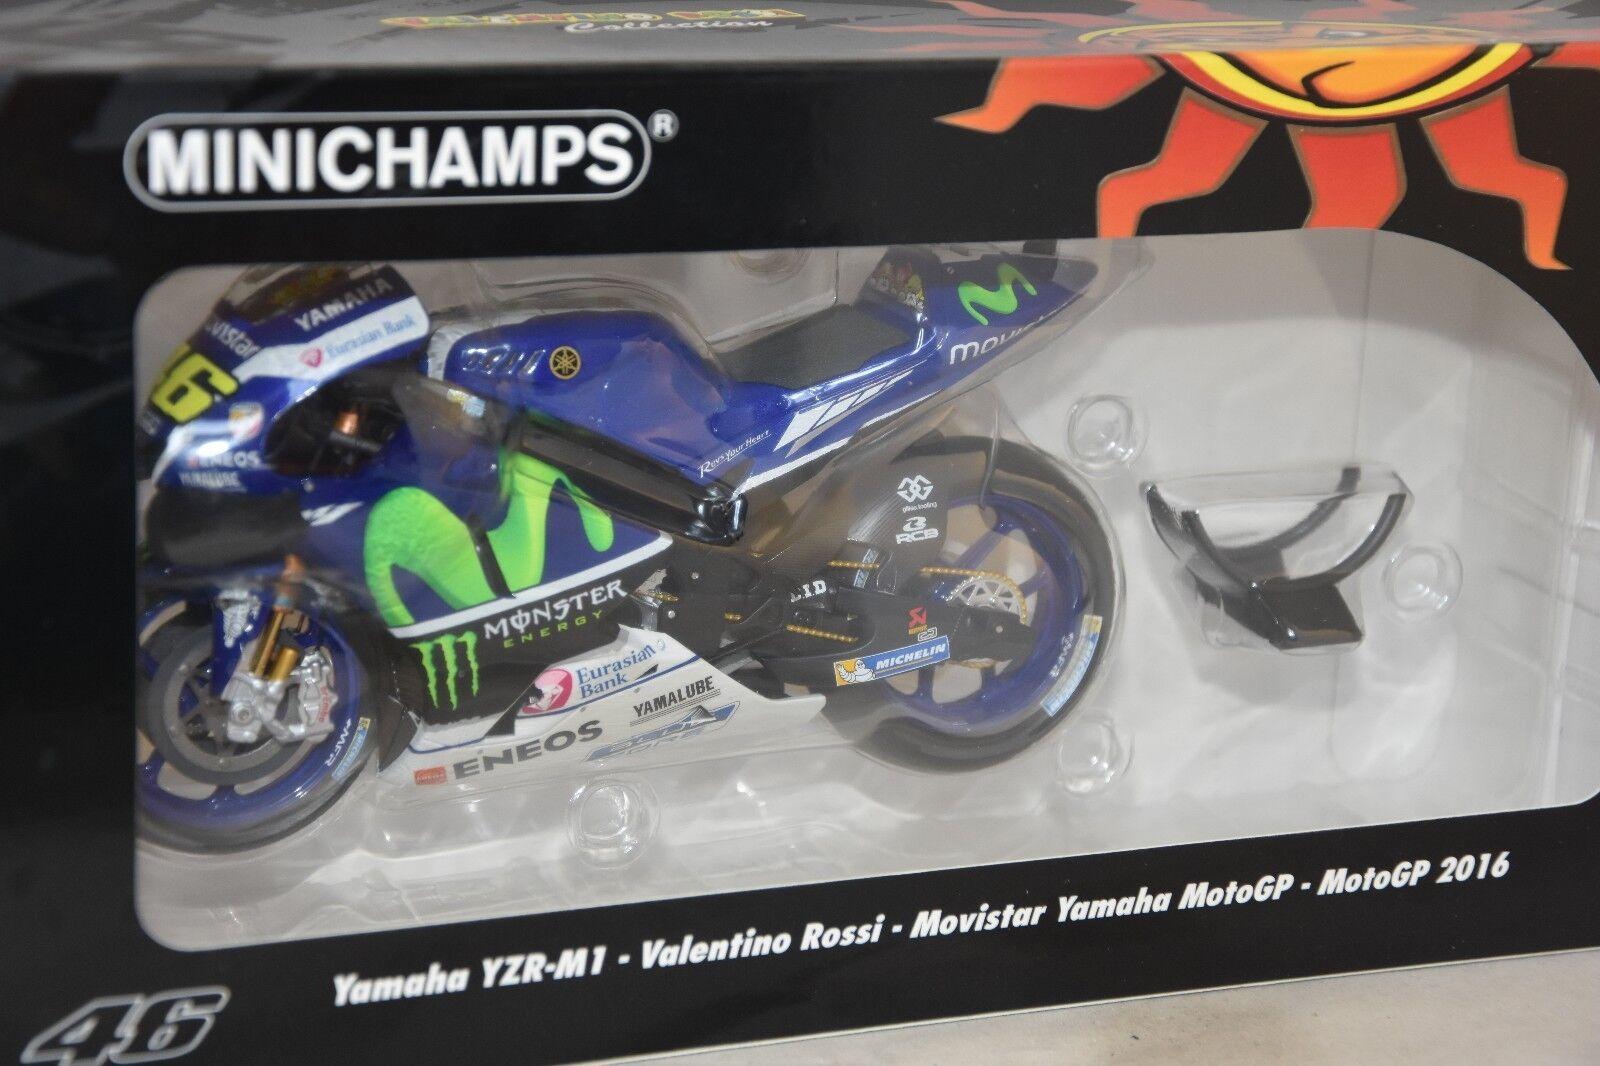 Minichamps 122163046 - YAMAHA YZR M1 MOVISTAR YAMAHA MOTOGP 2016 Rossi 1 12